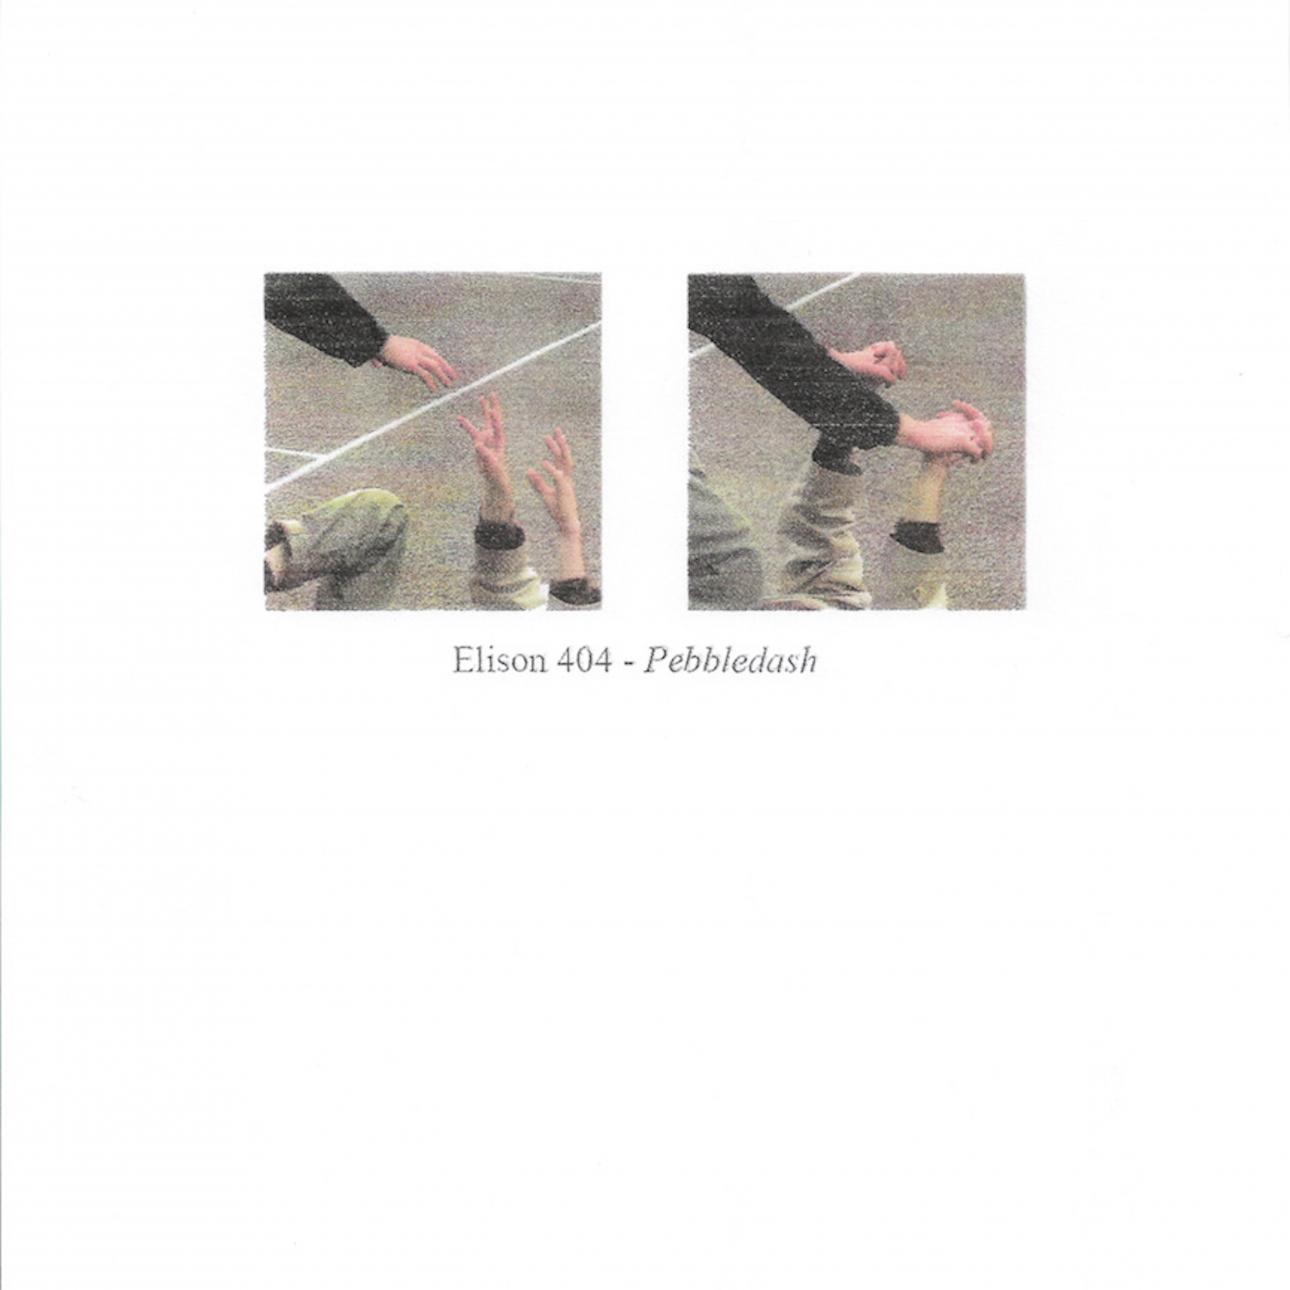 Elison 404 - Pebbledash   Album Review